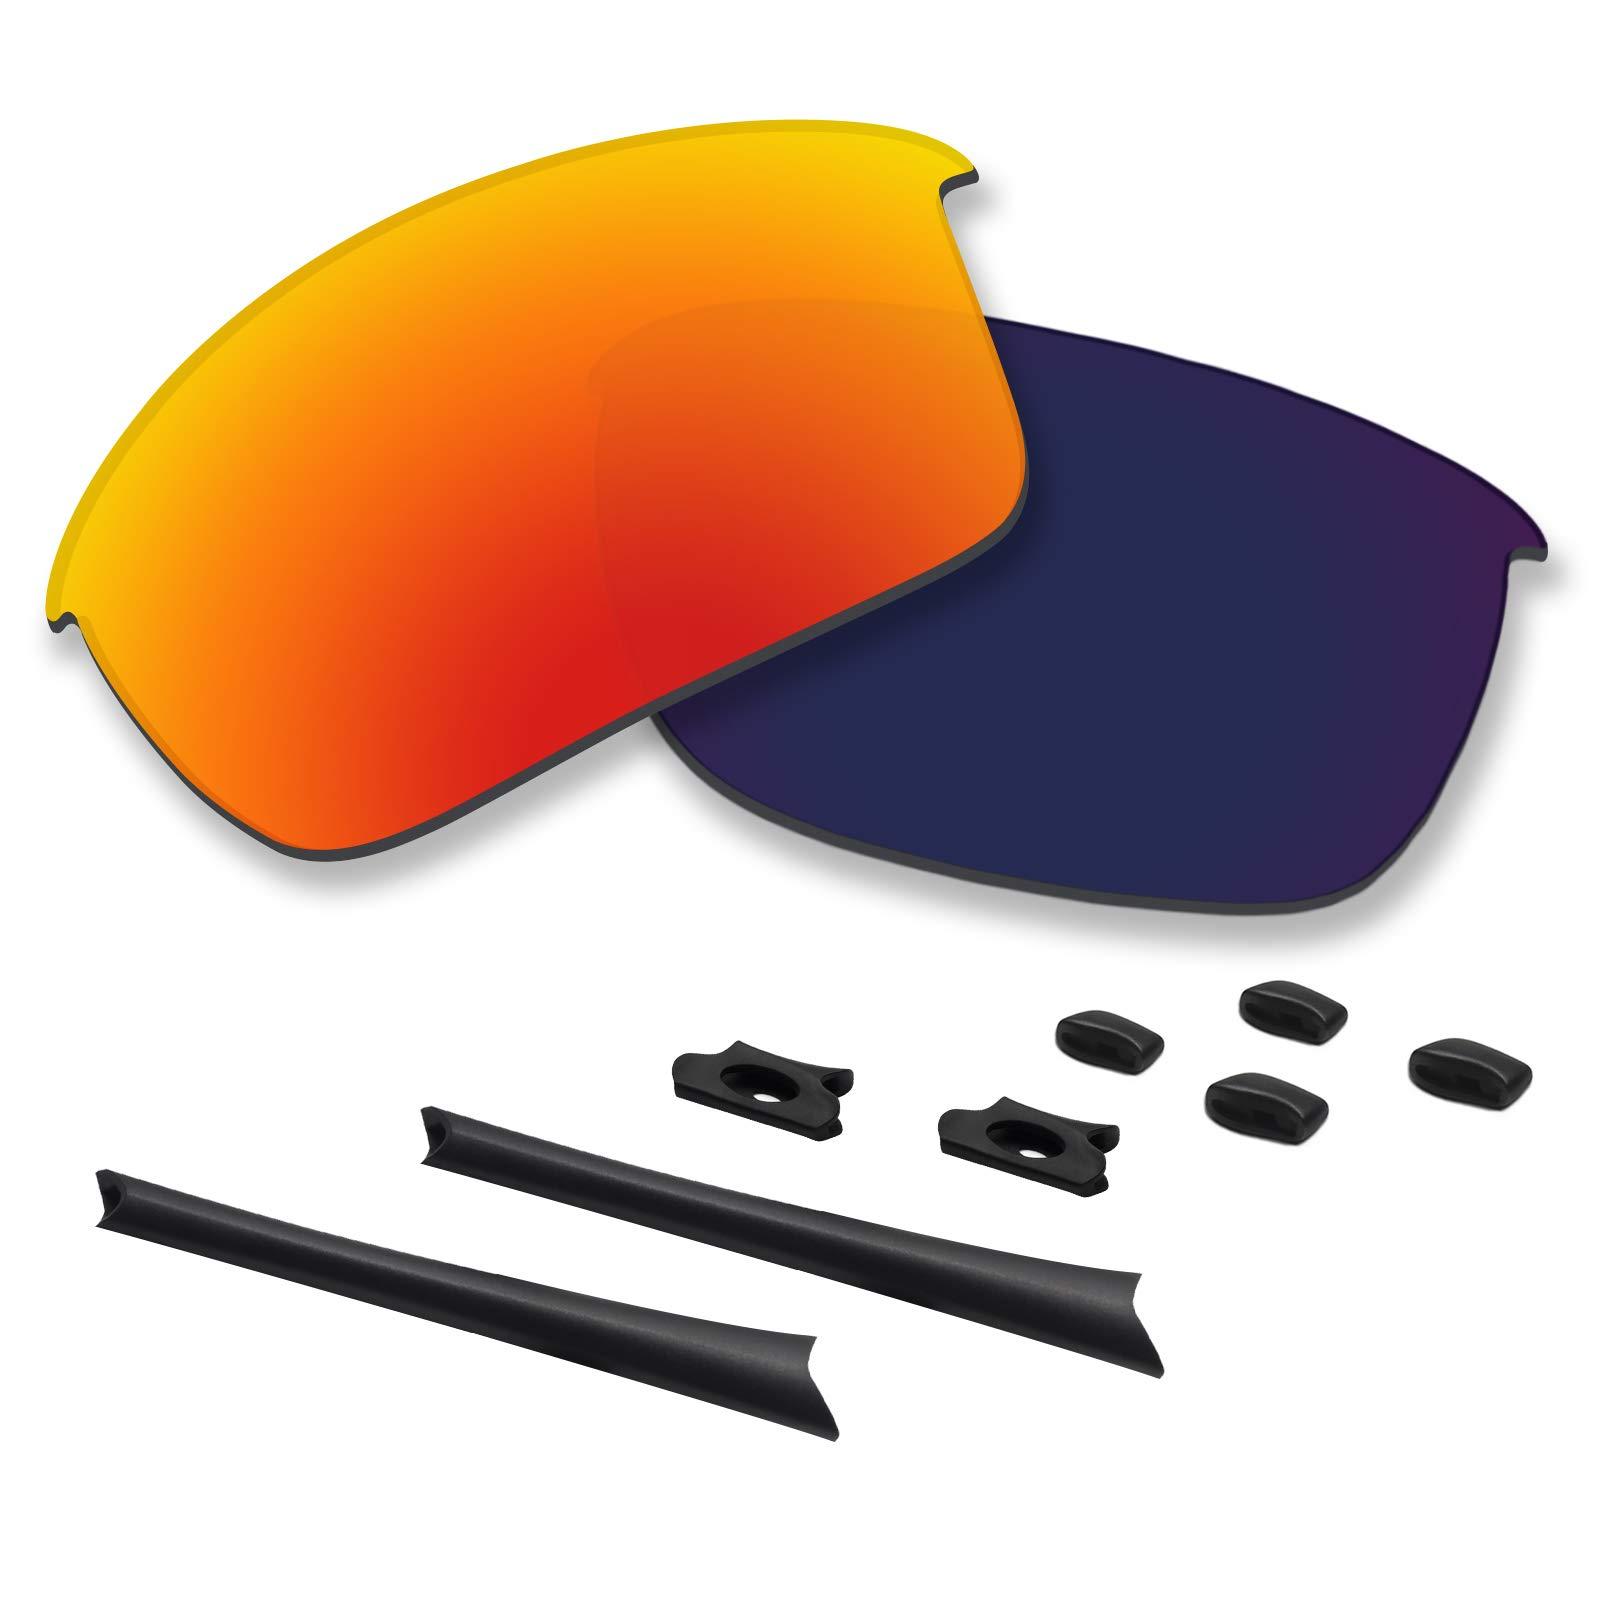 Betterun Polycarbonate Polarized Replacement Lenses/Rubber Kits for Oakley Flak Jacket